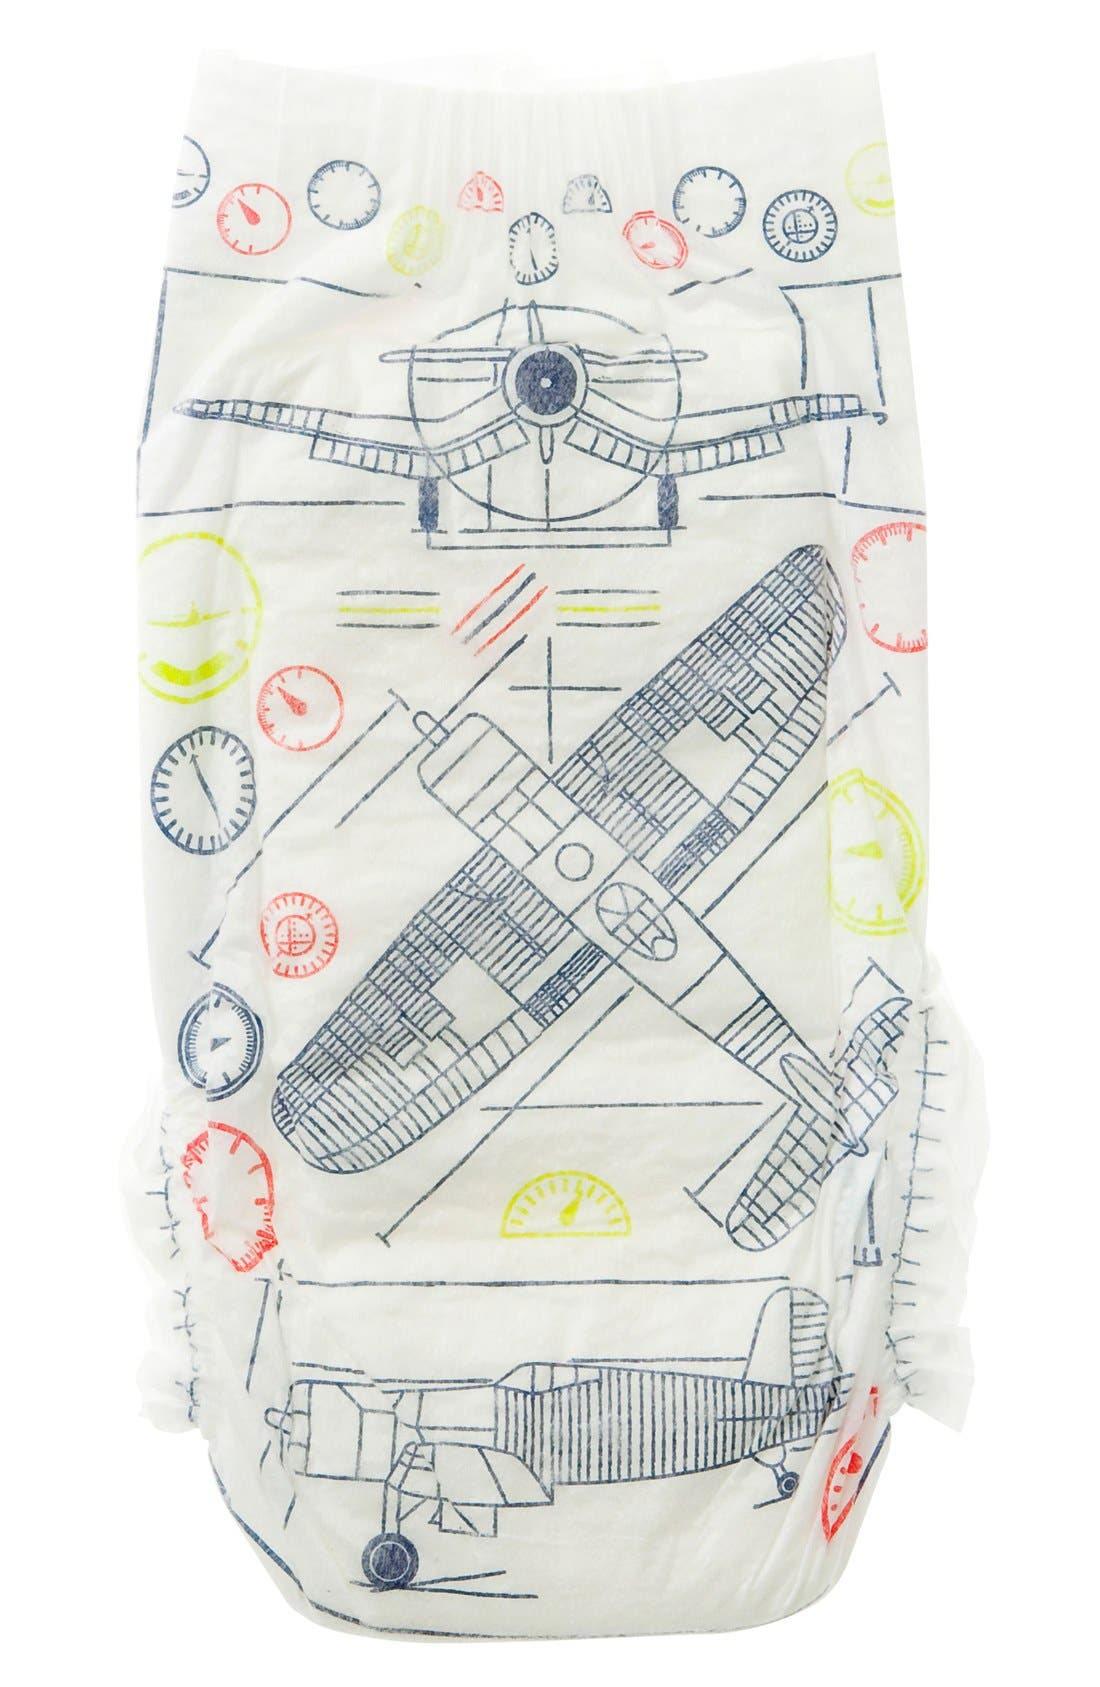 THE HONEST COMPANY Premium Eco-Friendly Training Pants